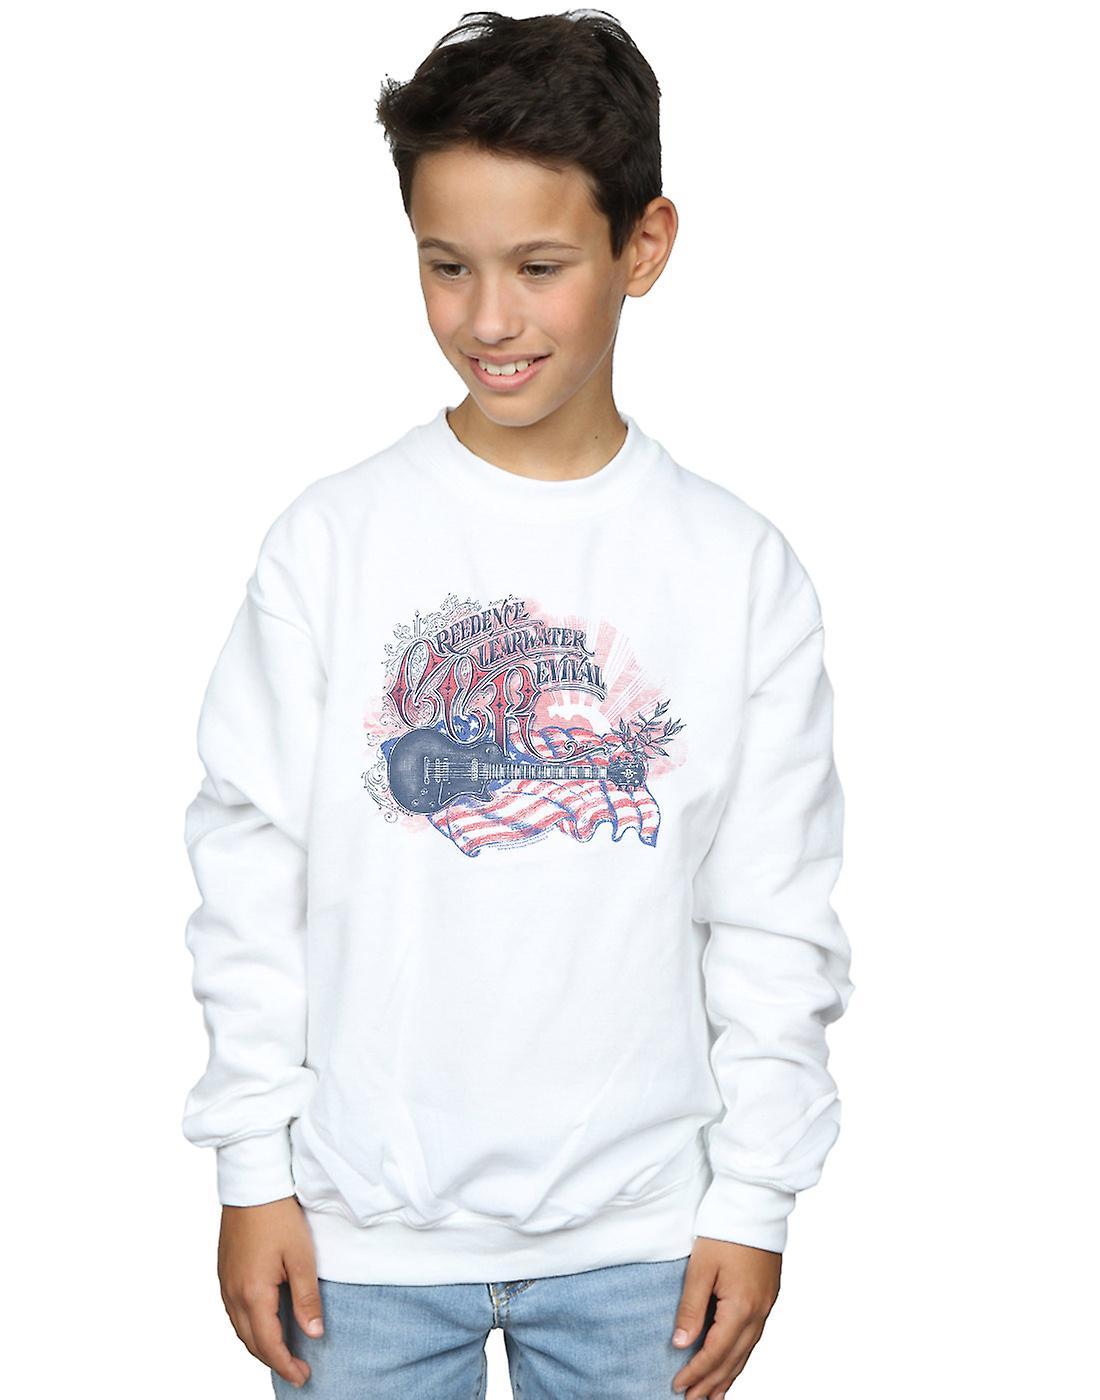 Creedence Clearwater Revival Boys Guitar Flag Sweatshirt